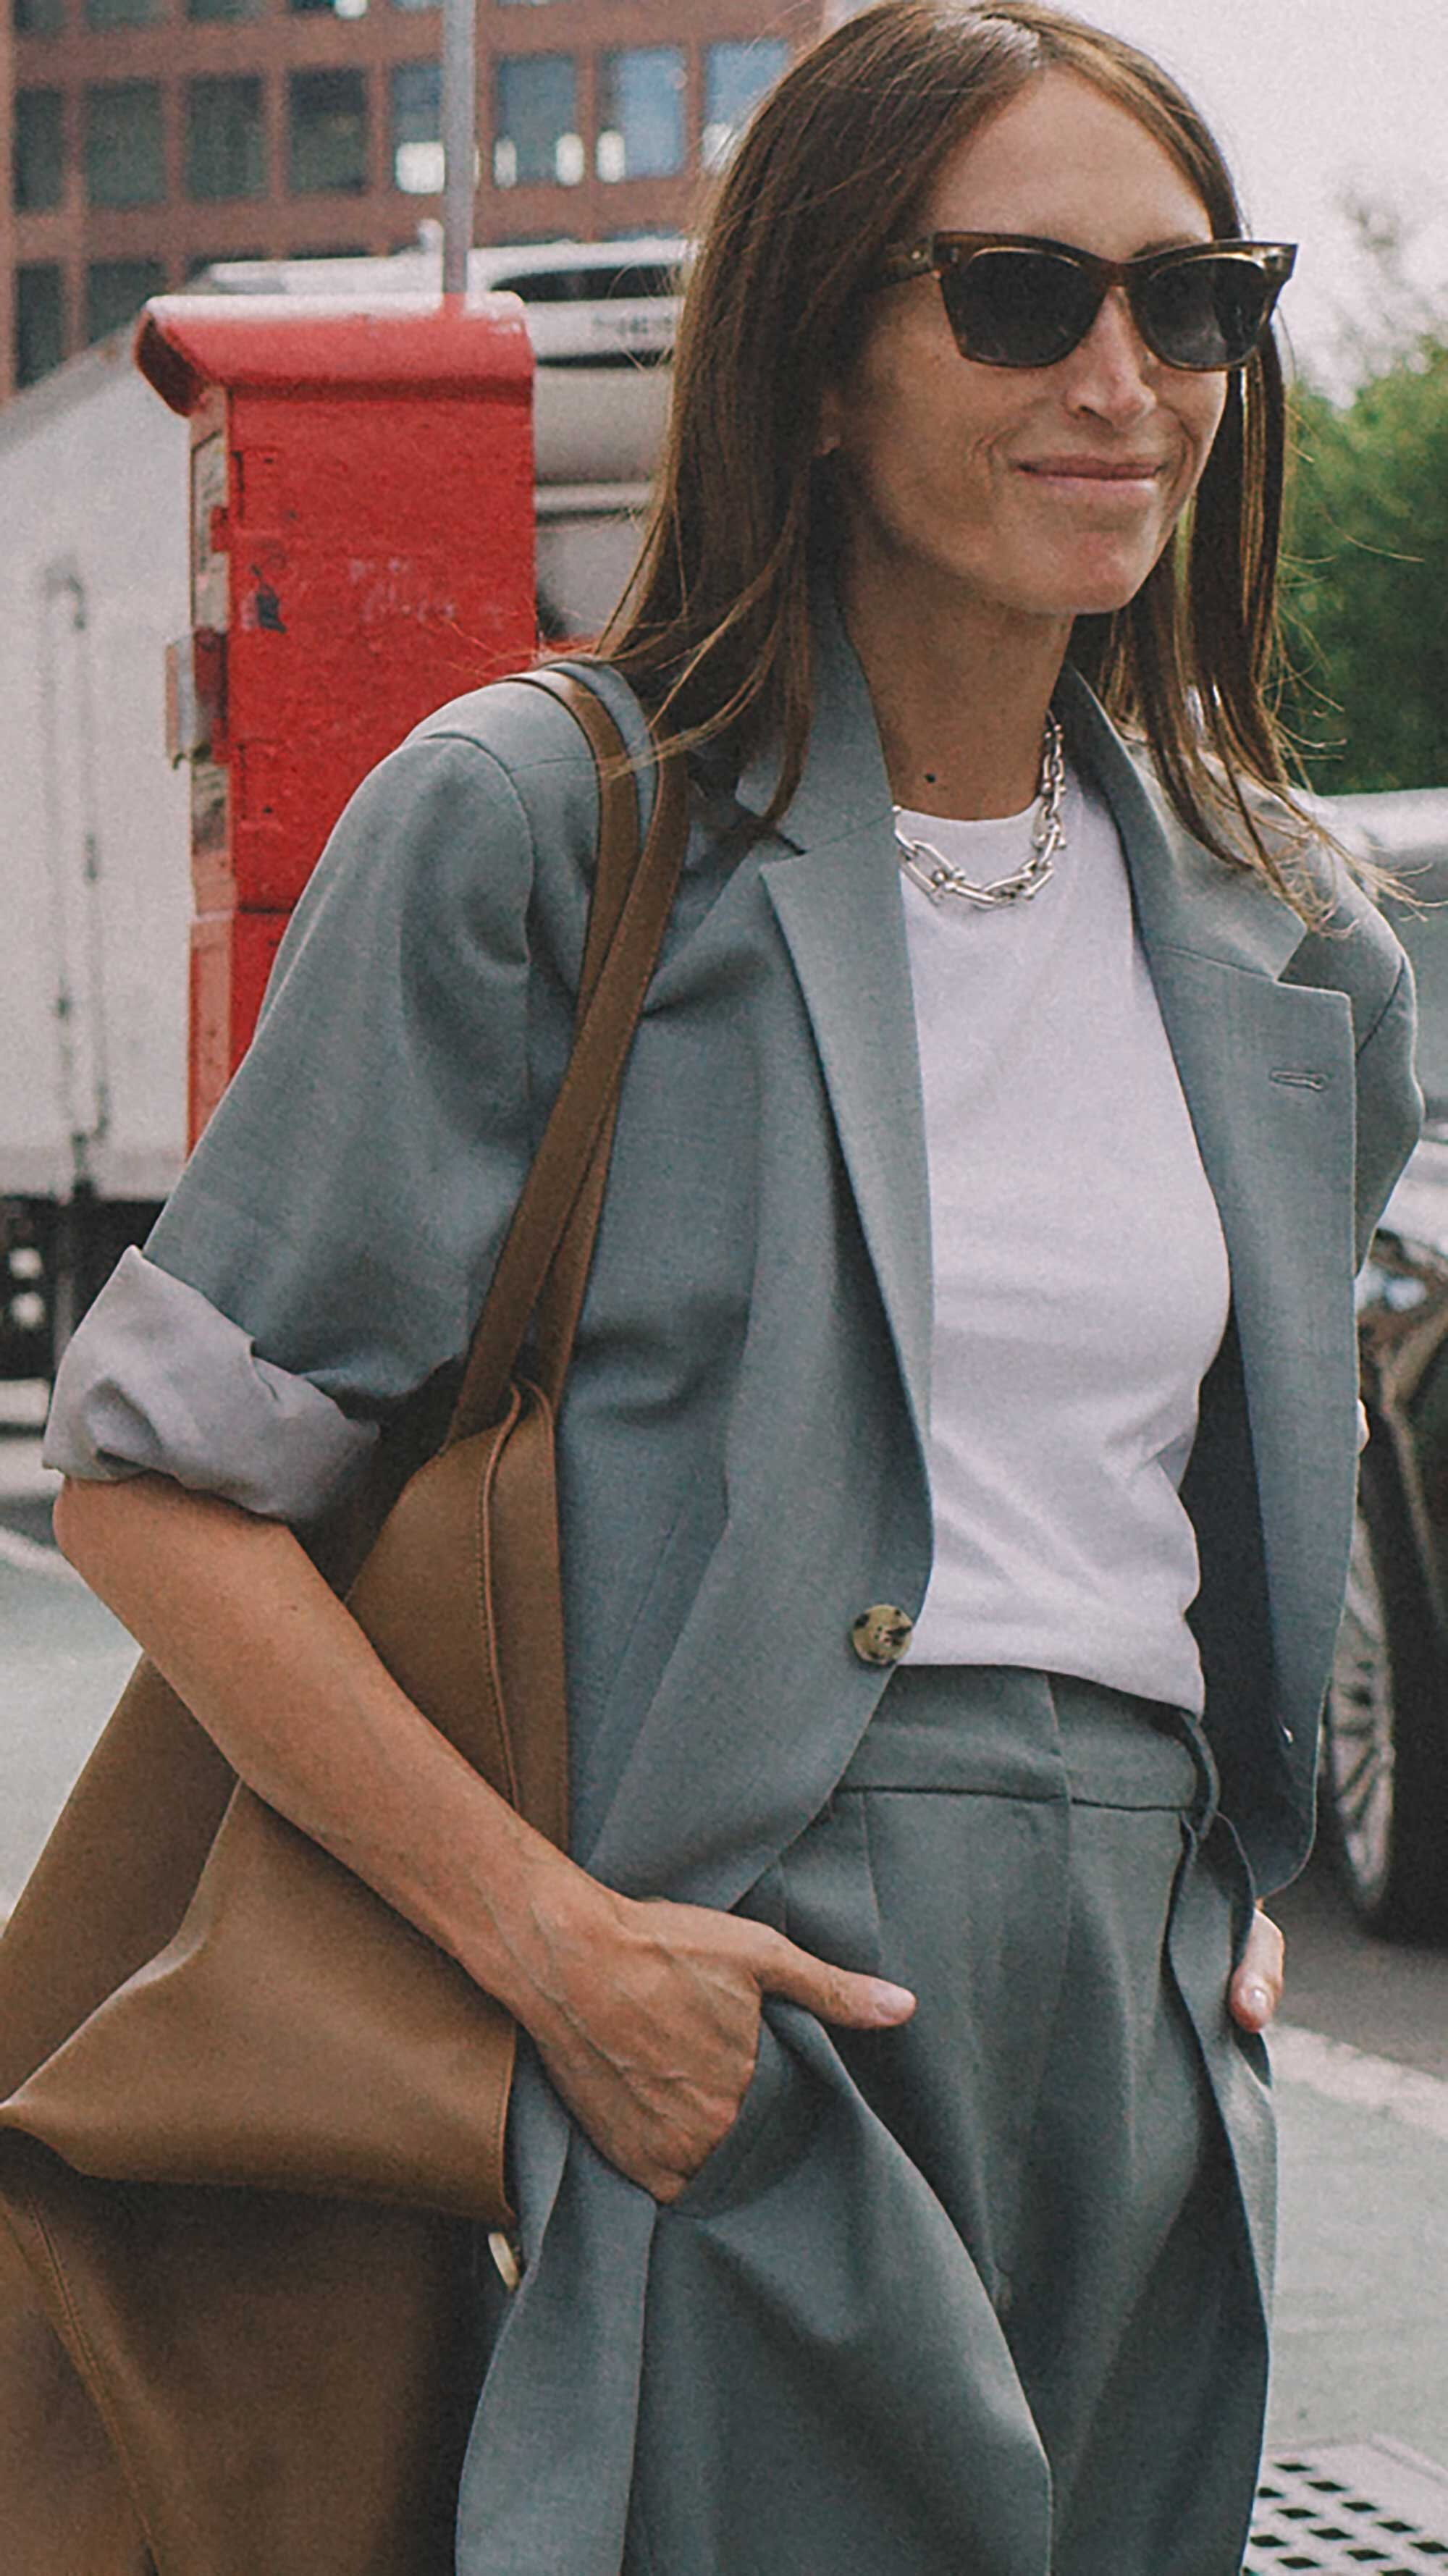 Click for more looks! Best outfits of New York Fashion Week street style 2019 Day Three Photo by @J2martinez Jose J. Martinez www.jmrtnz.com -86.jpg